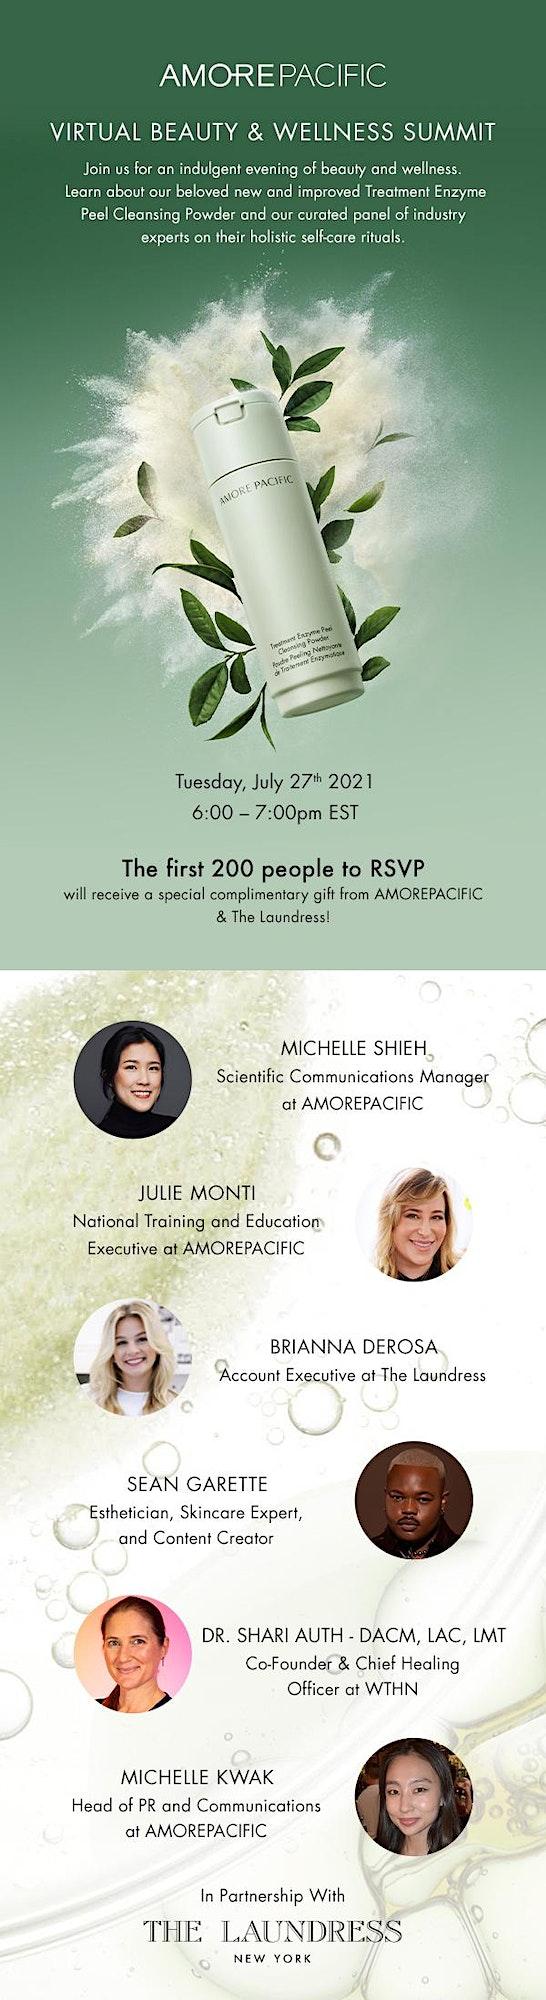 AMOREPACIFIC Beauty & Wellness Virtual Summit image